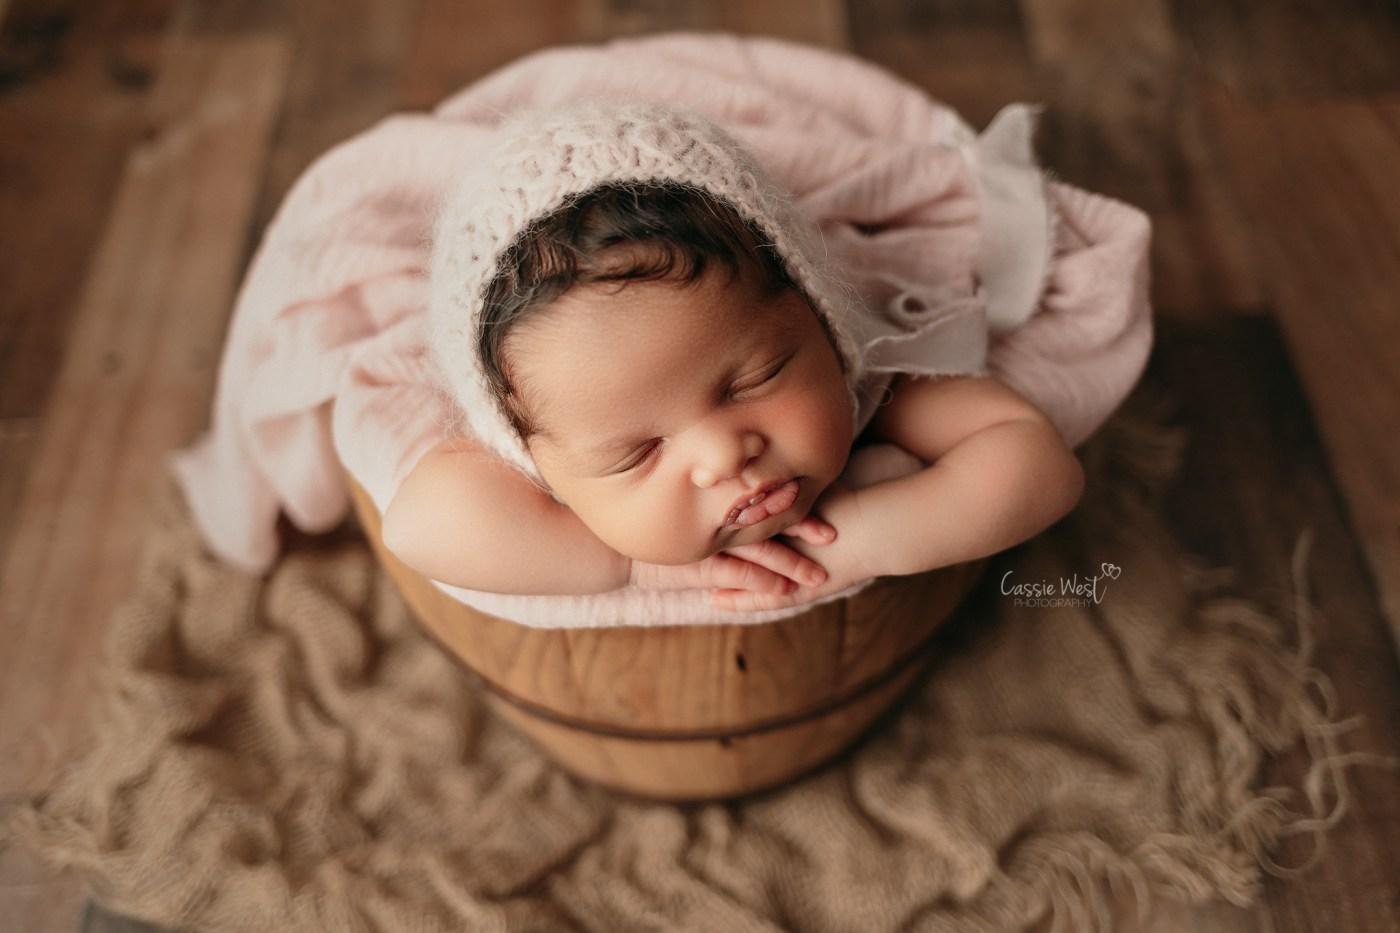 ct newborn photographer, connecticut newborn photographer, baby photos, ct photographer, newborn photos, newborn photographer near me